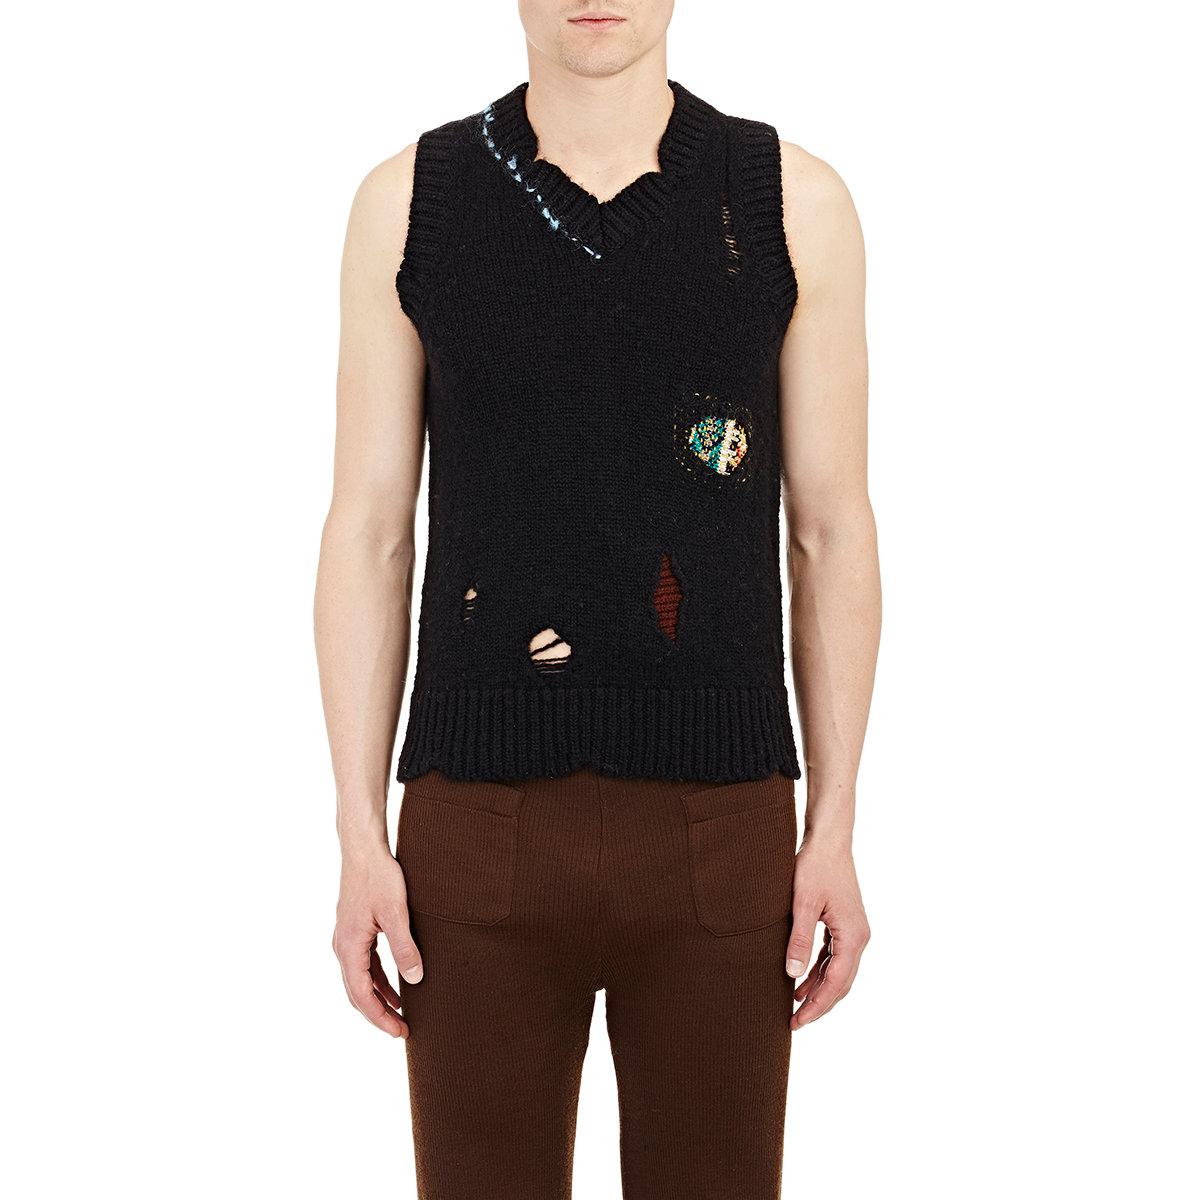 Raf simons Distressed Sweater Vest in Black for Men | Lyst